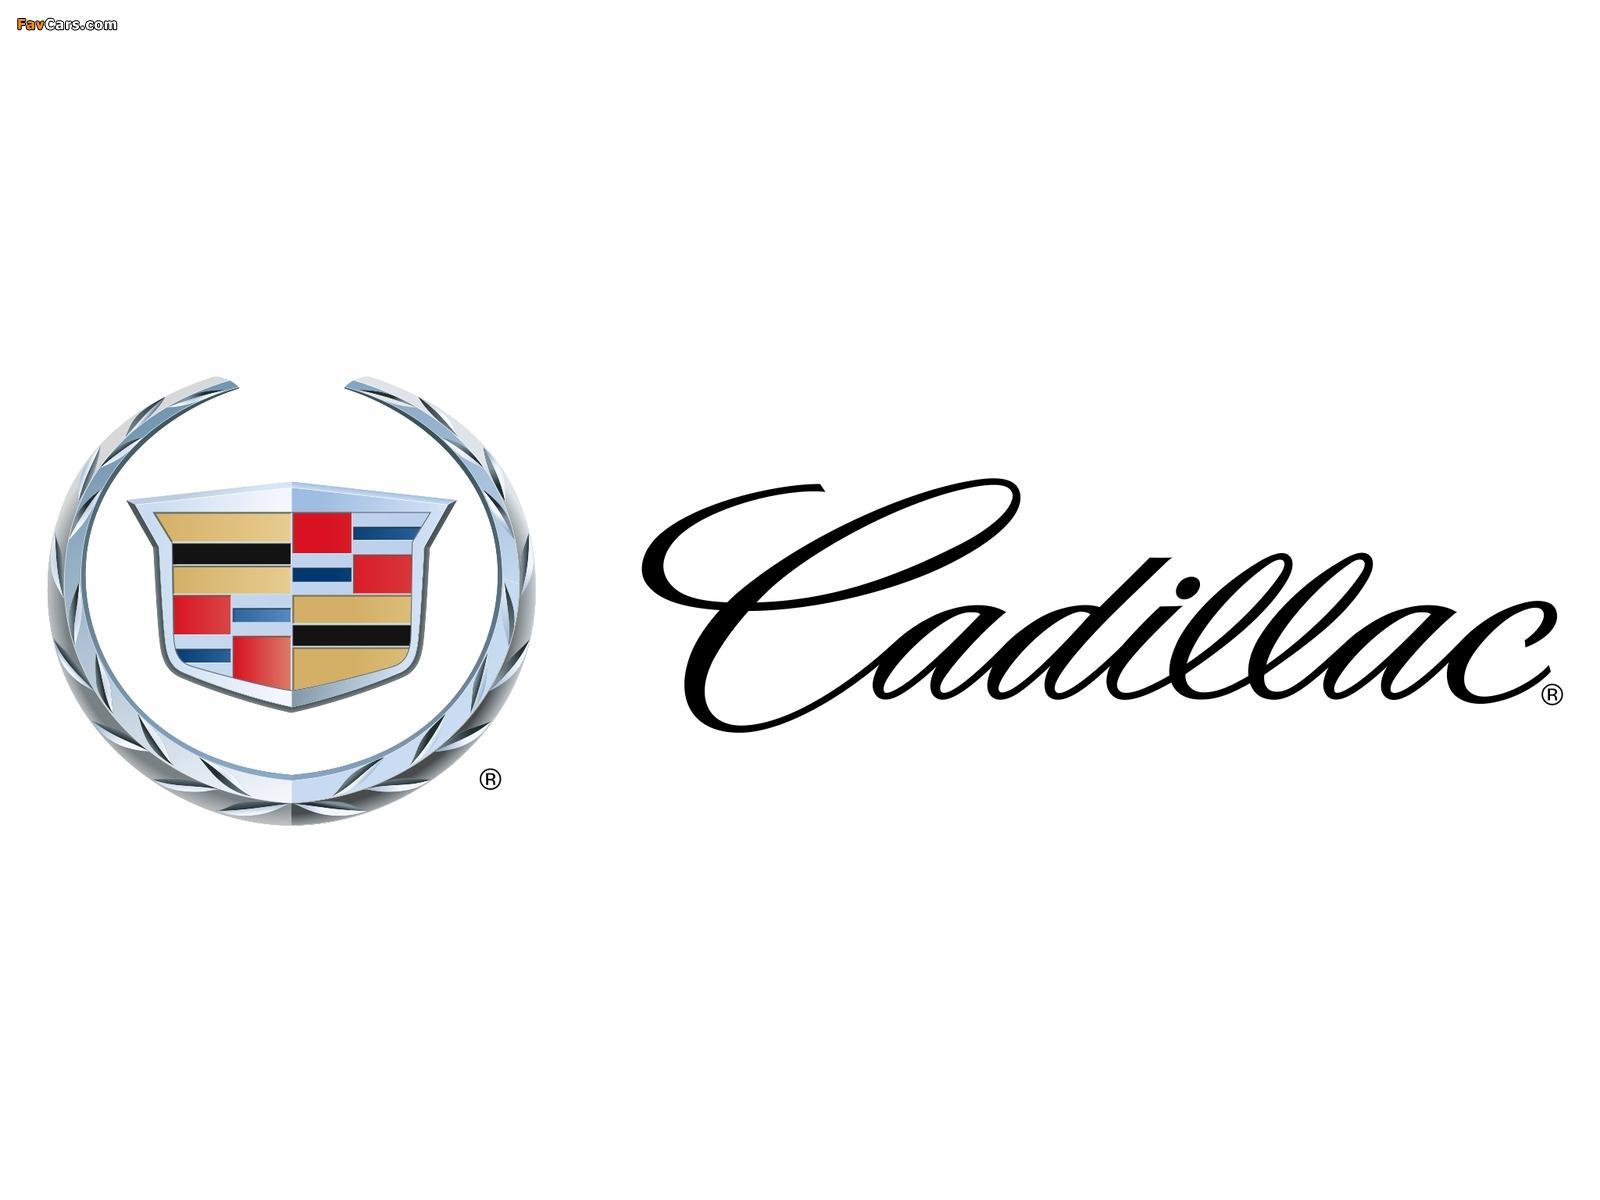 Cadillac 2002-10 wallpapers (1600 x 1200)